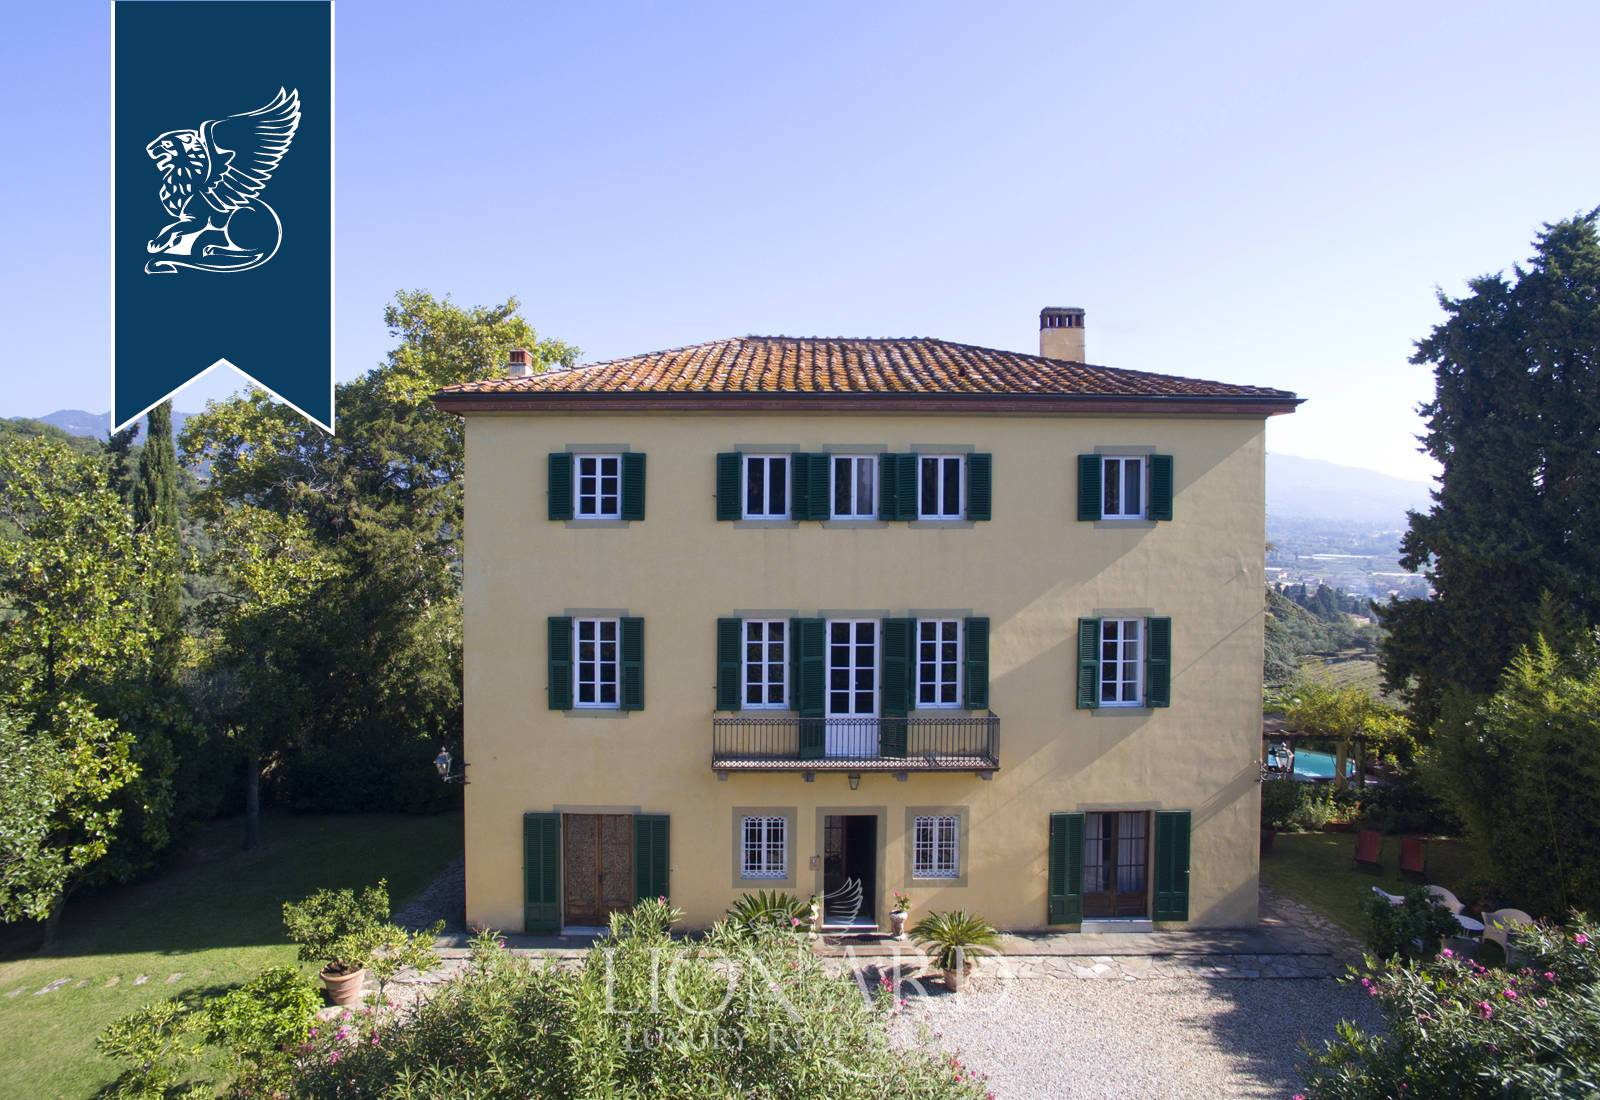 Villa in Vendita a Lucca: 0 locali, 600 mq - Foto 8